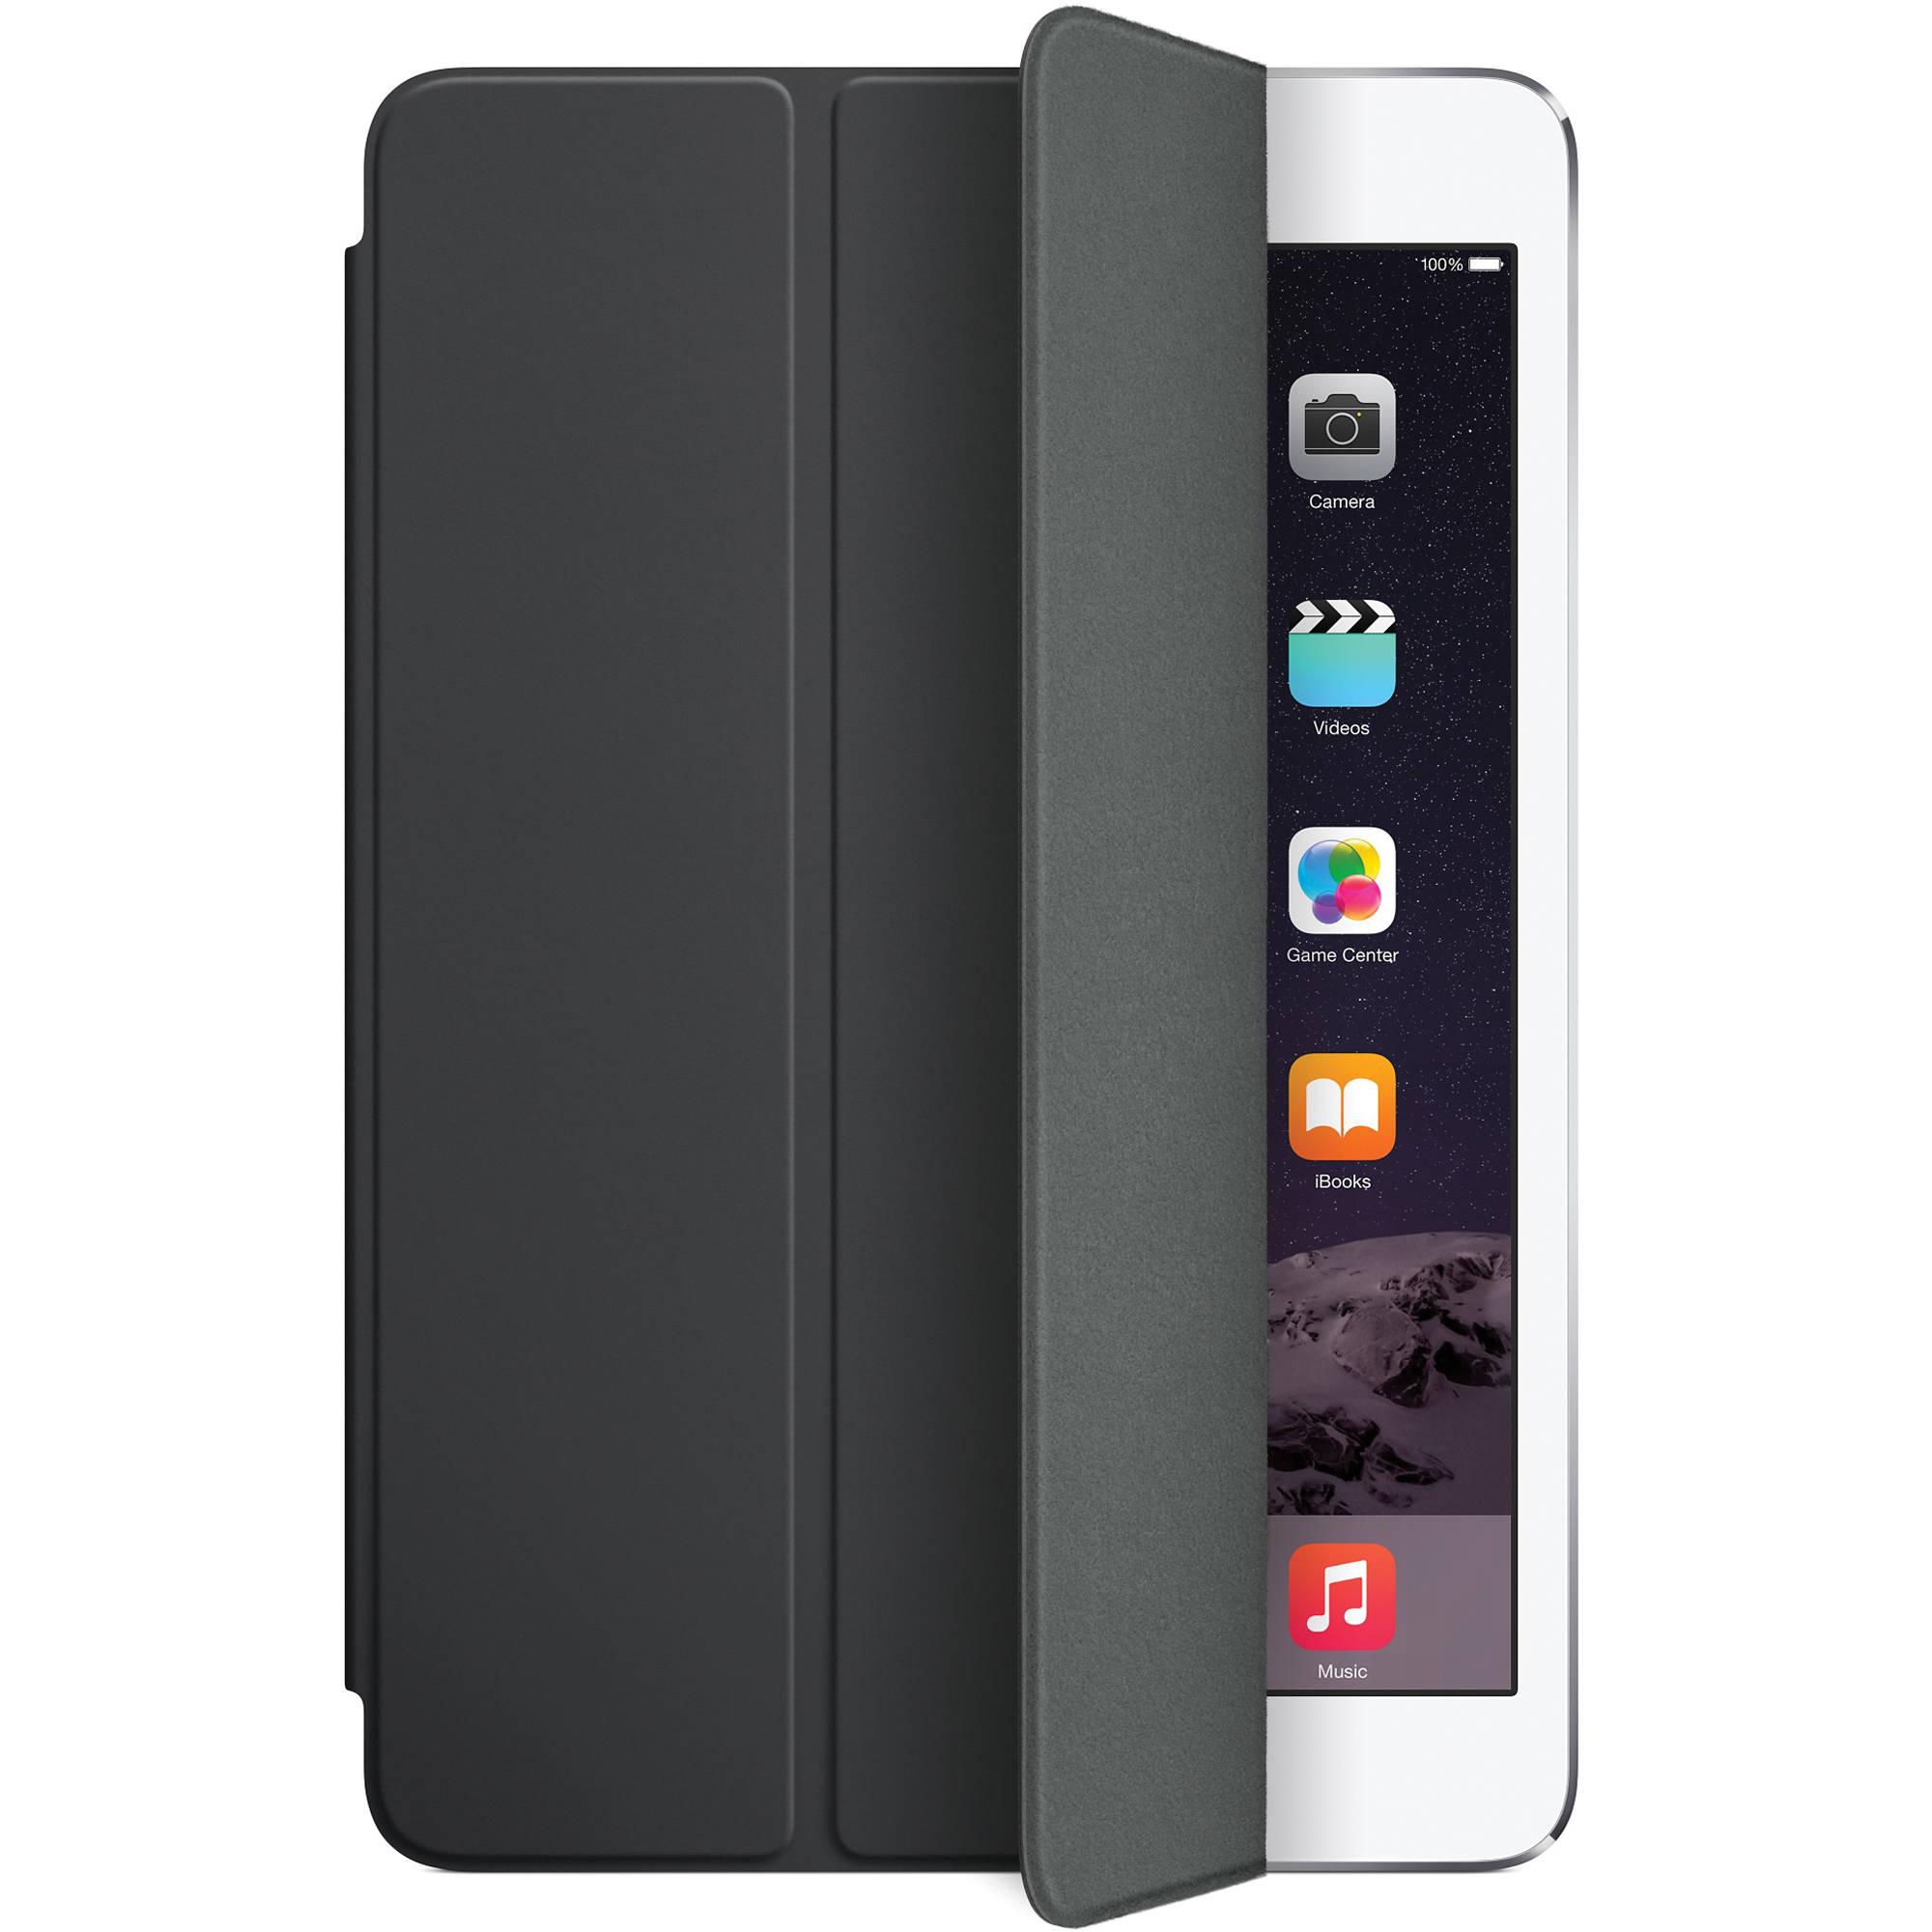 Apple Smart Cover for iPad mini 1/2/3 (Black) MGNC2ZM/A B&H